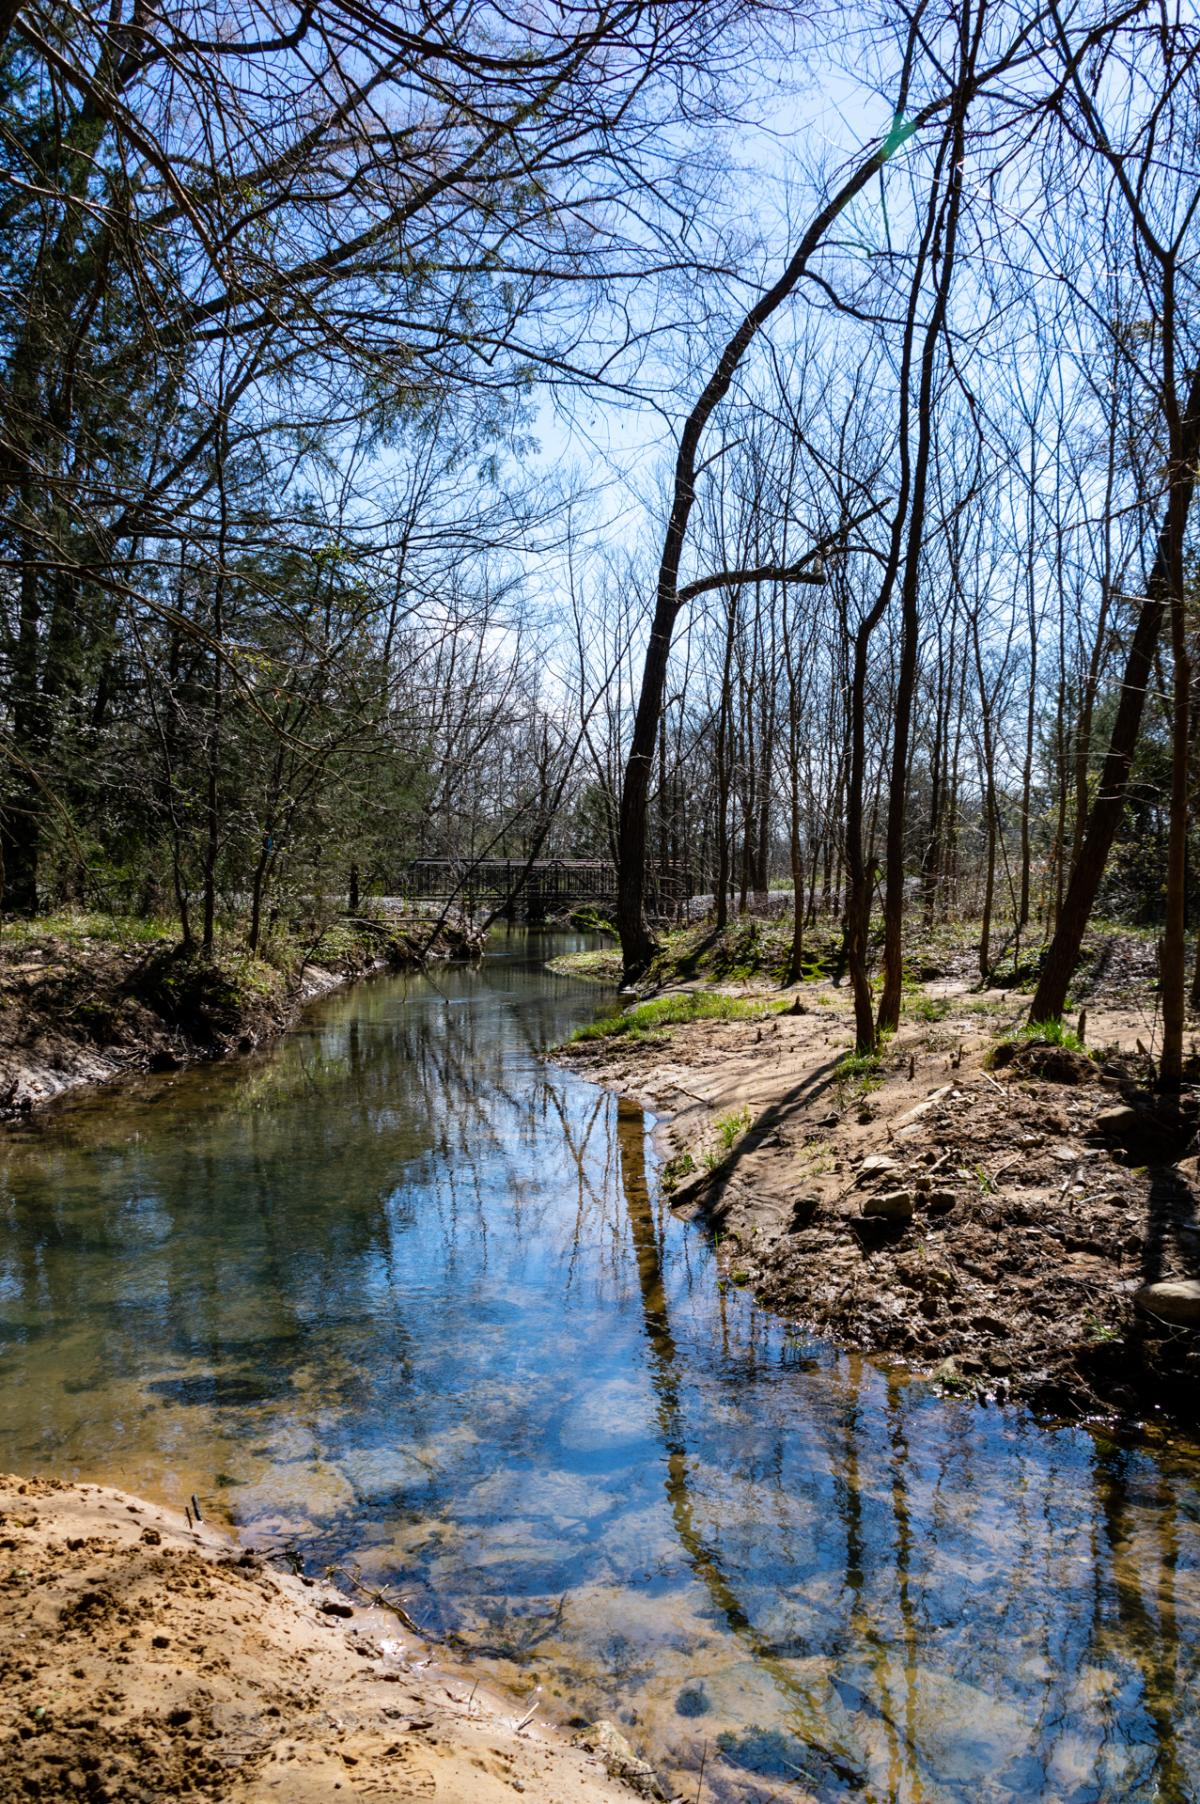 Bridge at Beth Spring Nature Preserve